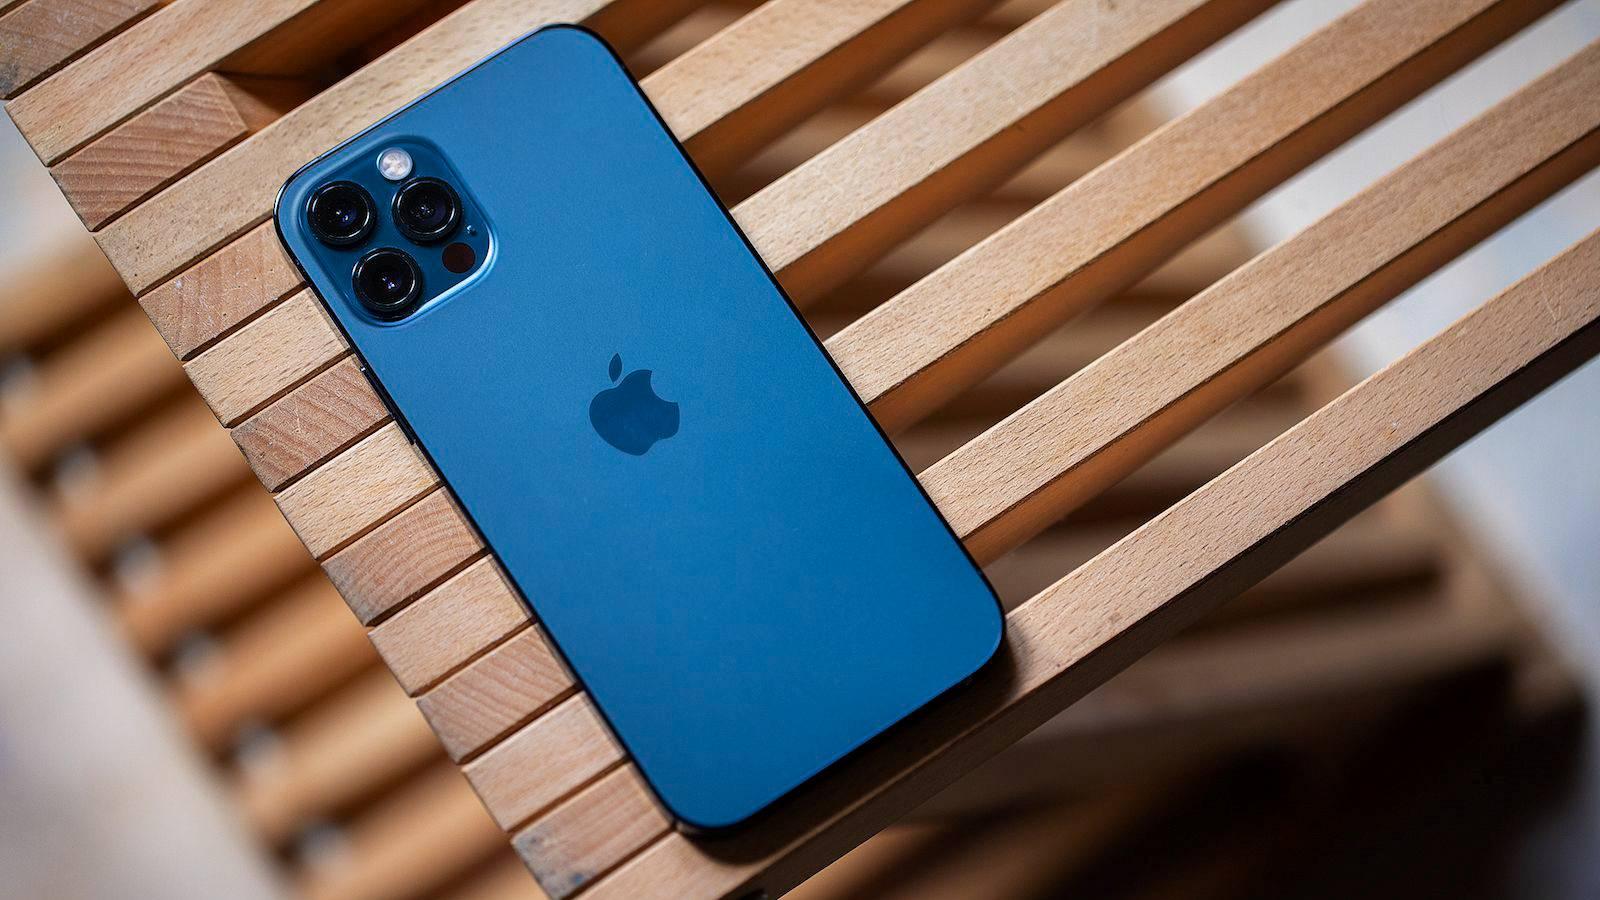 iPhone 12 DISTRUGE Android e cel mai BINE Vandut Telefon 5G